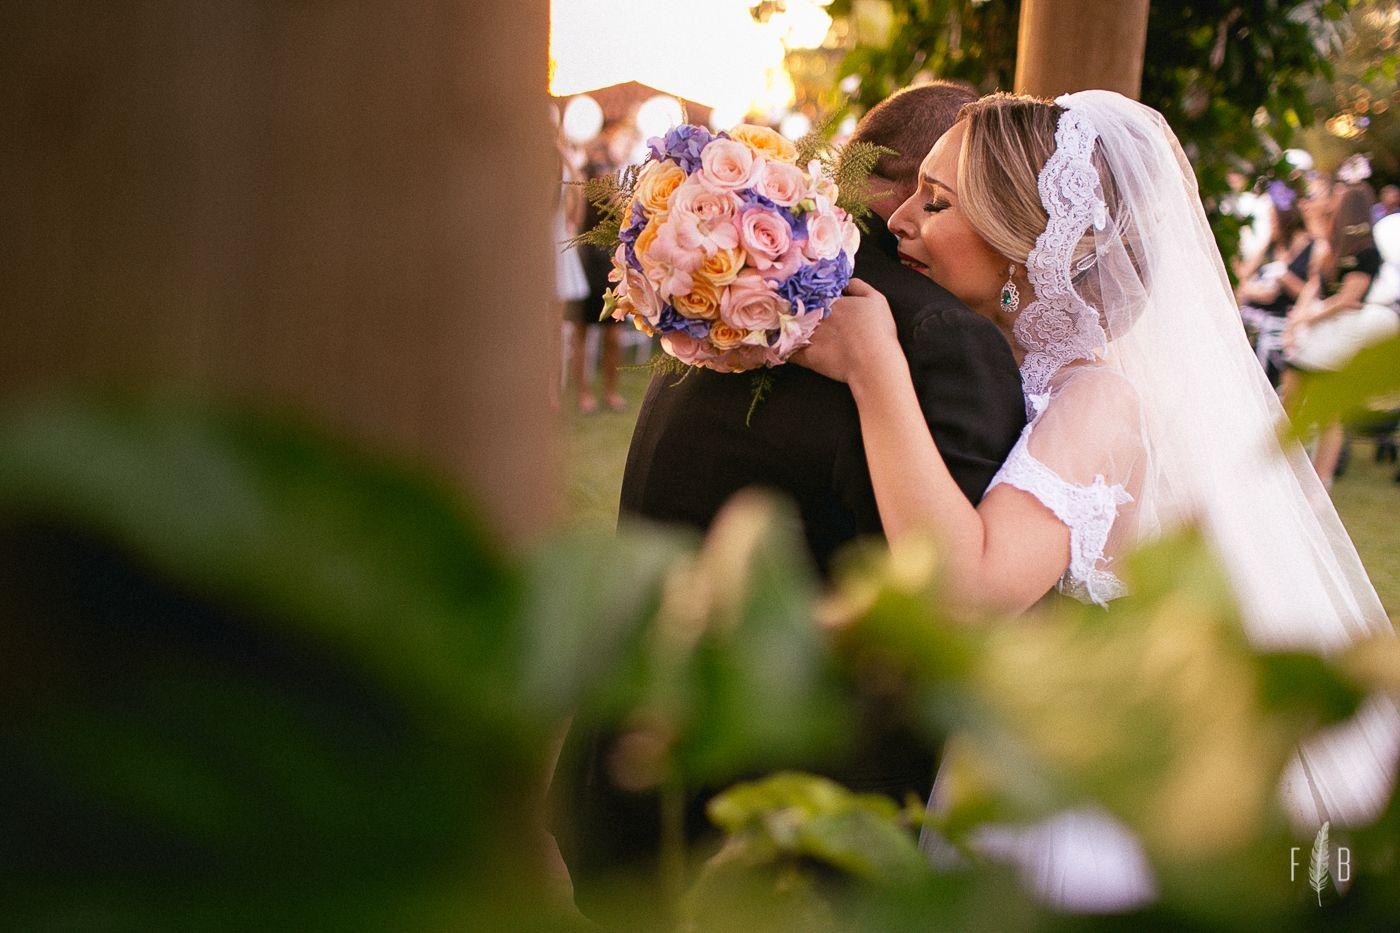 Casamento Diurno de Thailla e Rodolfo em Rio Preto por Fabricio Brisola-22